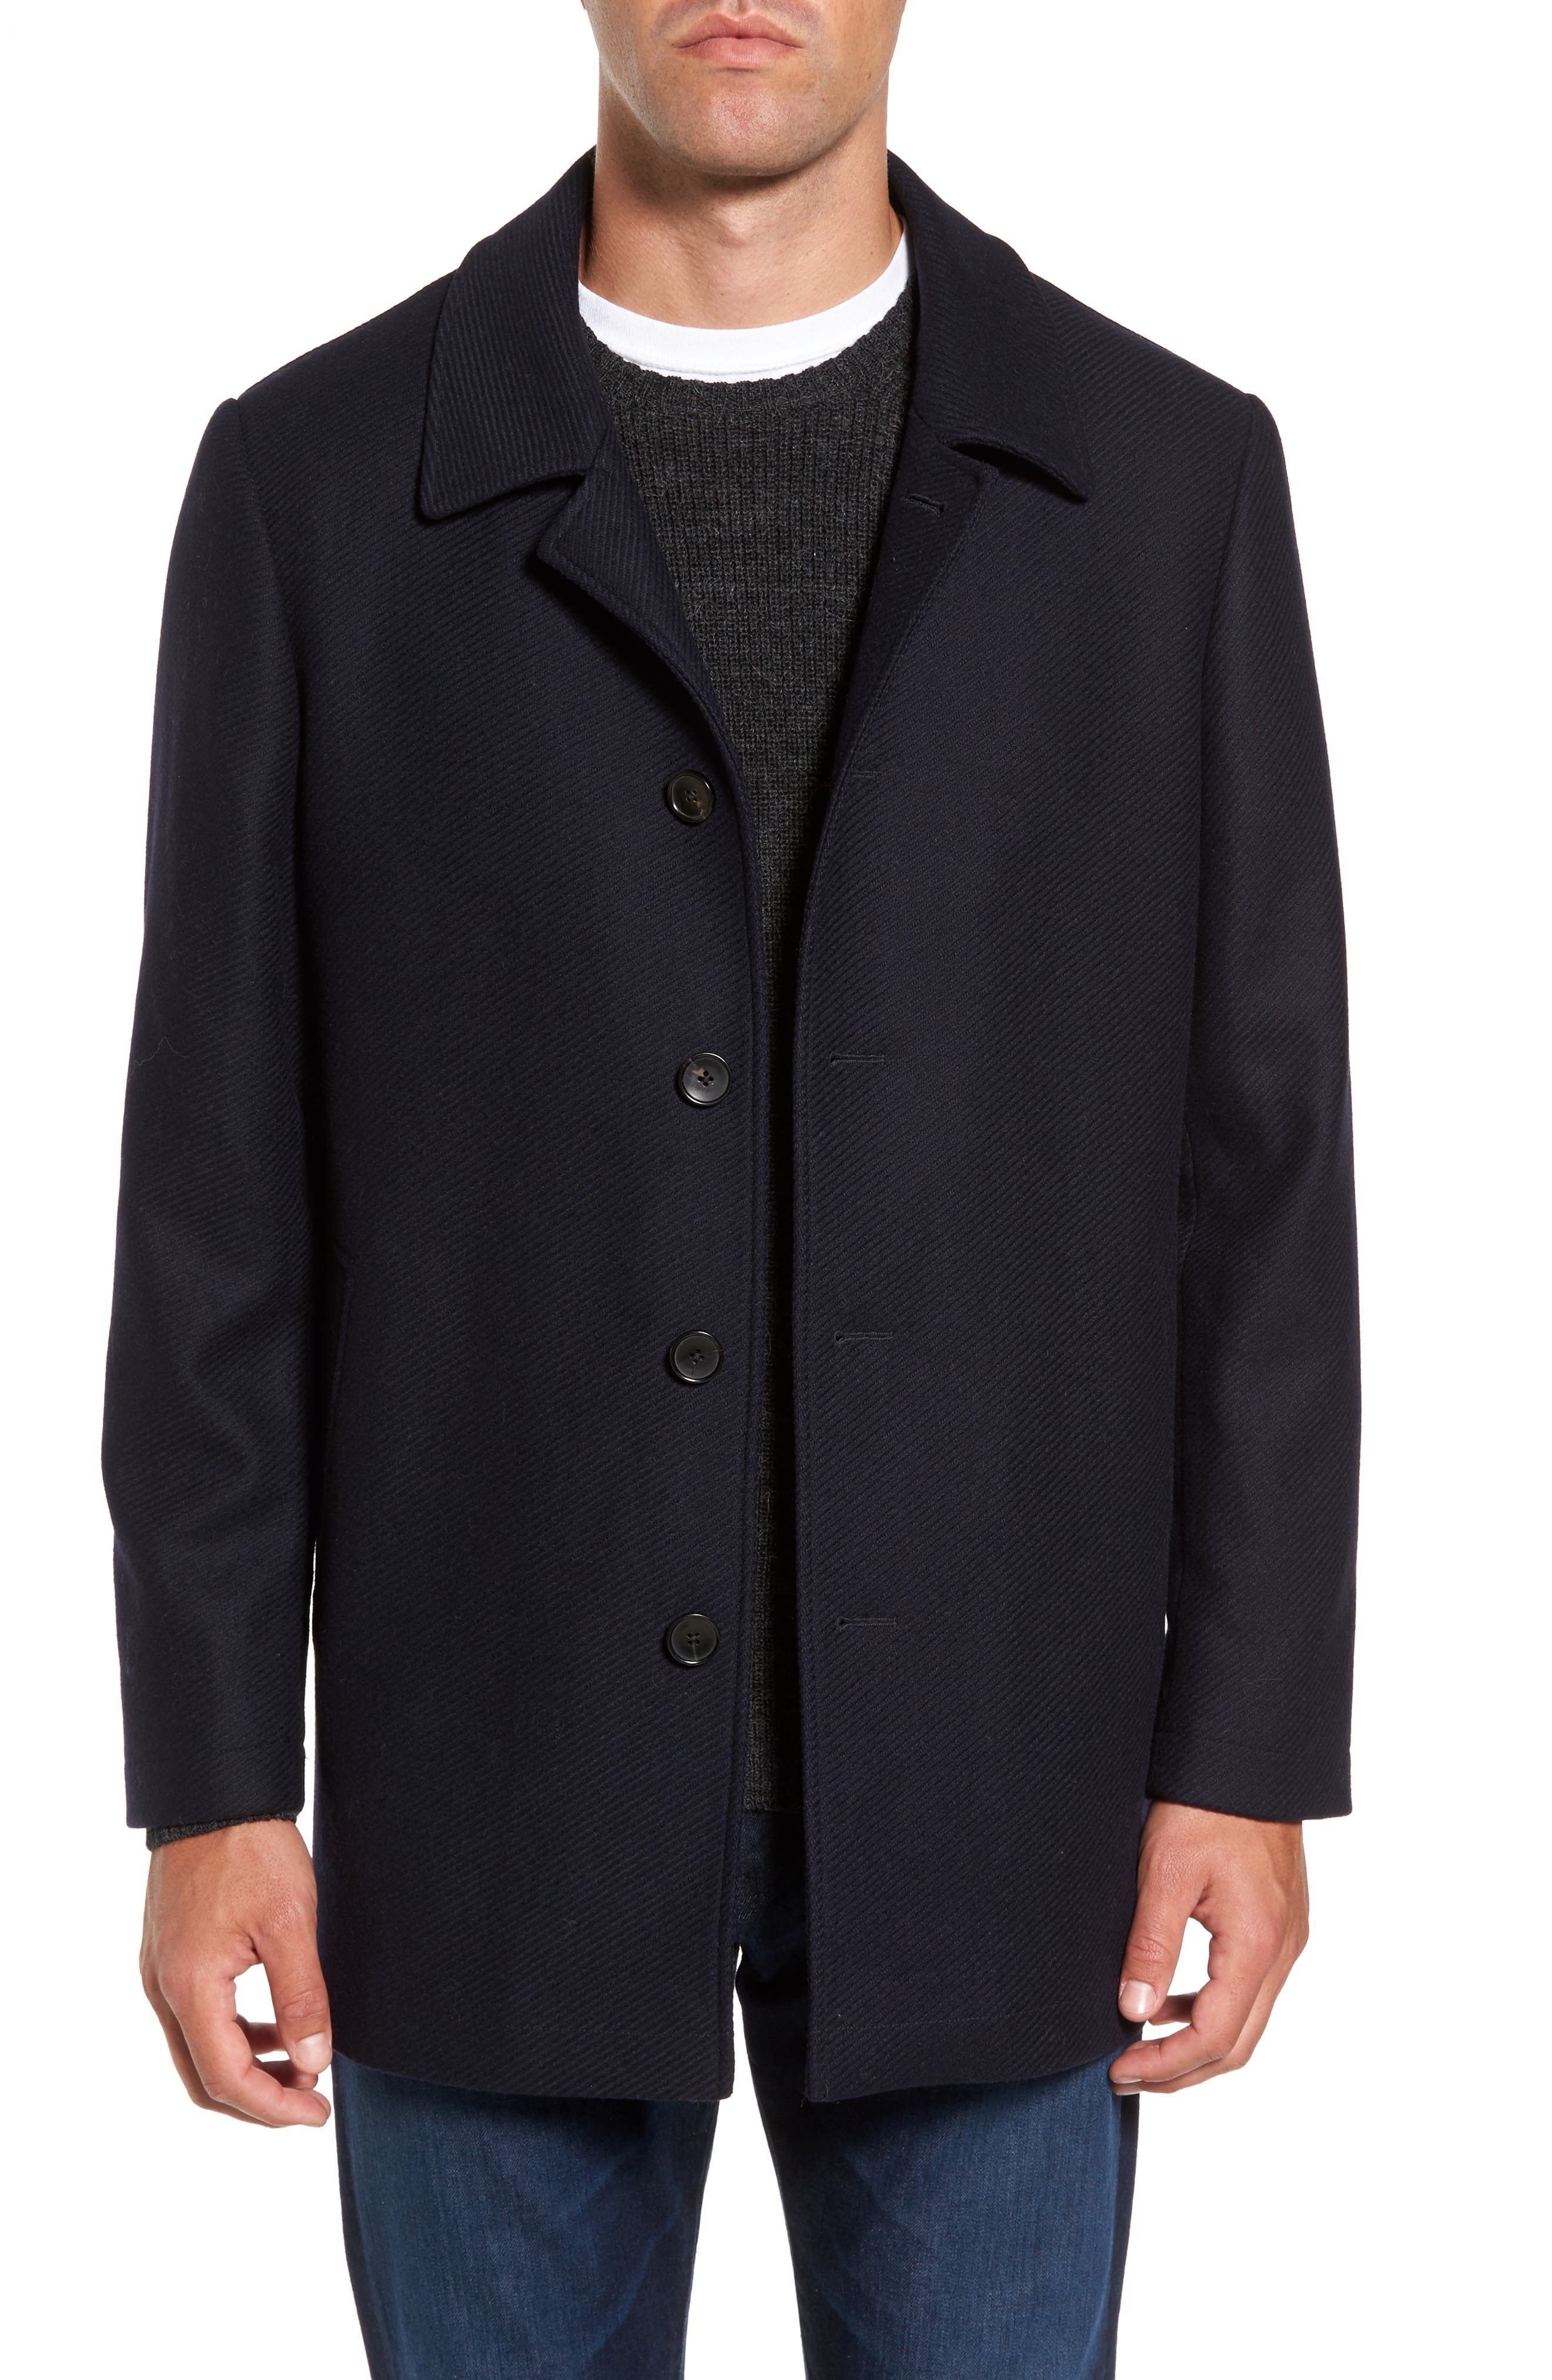 Rodd & Gunn 'Saxon' Wool Blend Jacket